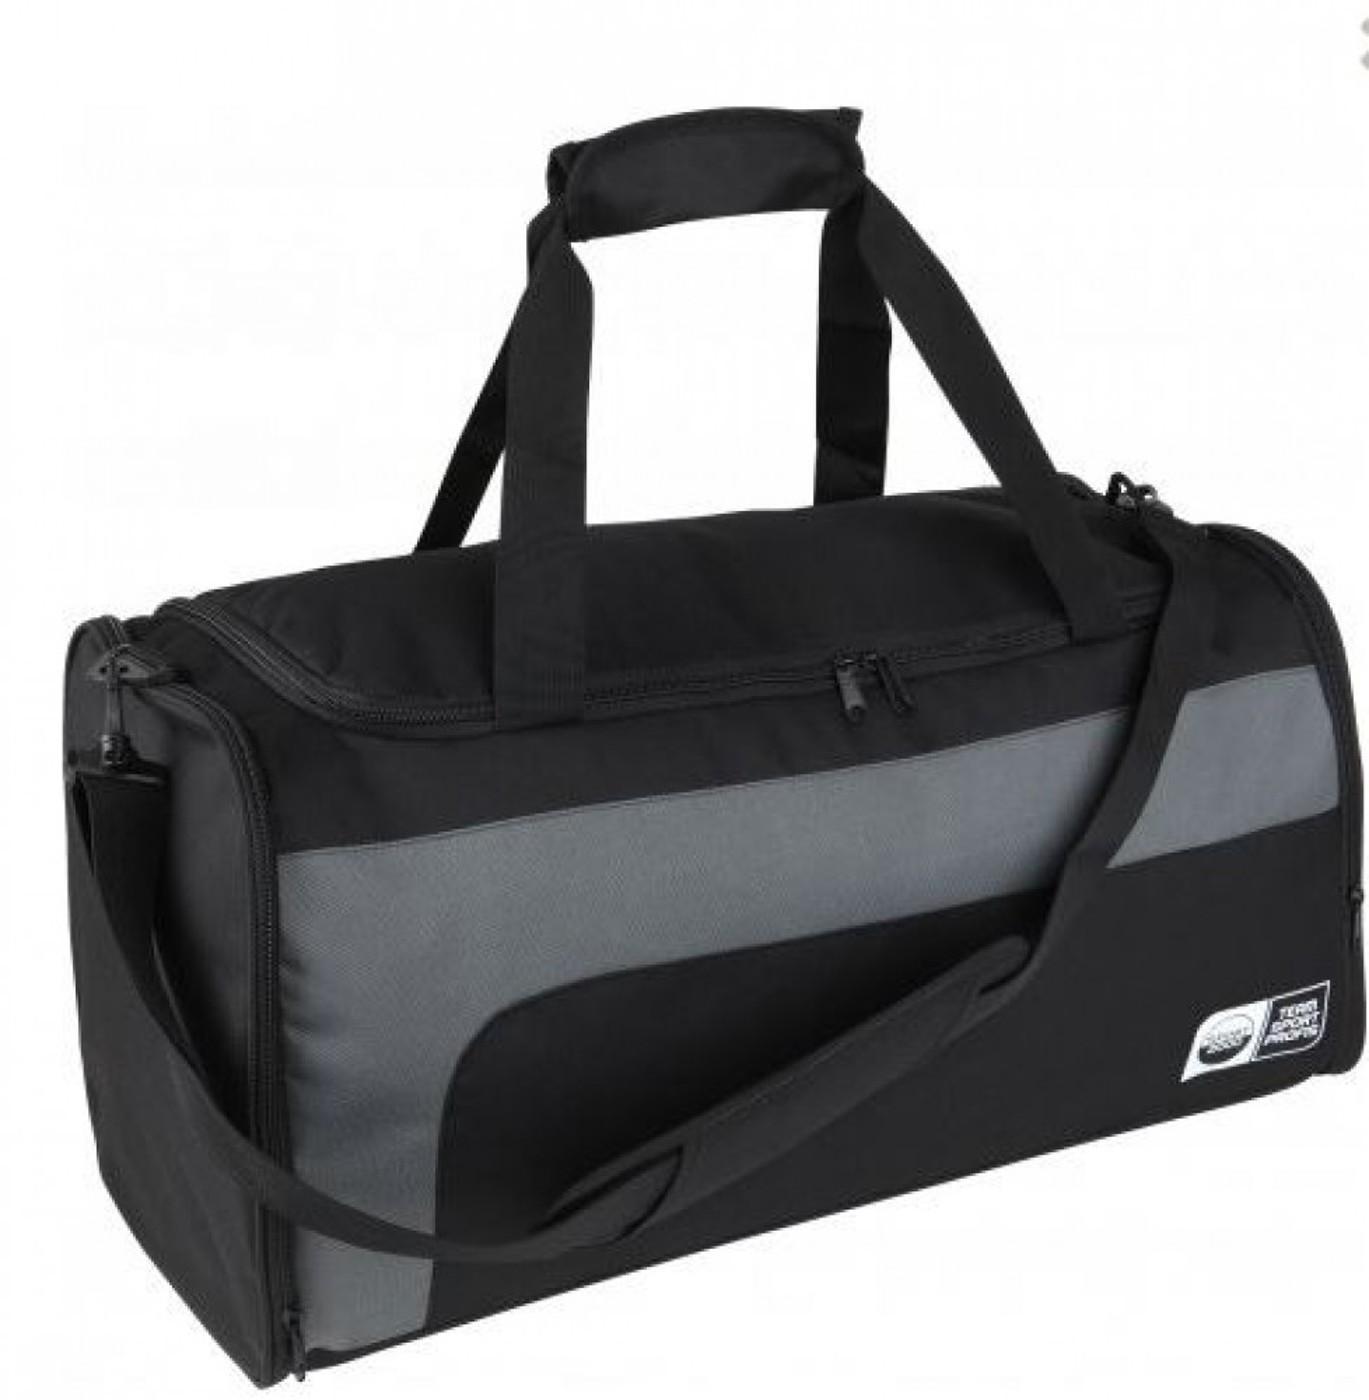 V3TEC CLUB TEAM BAG